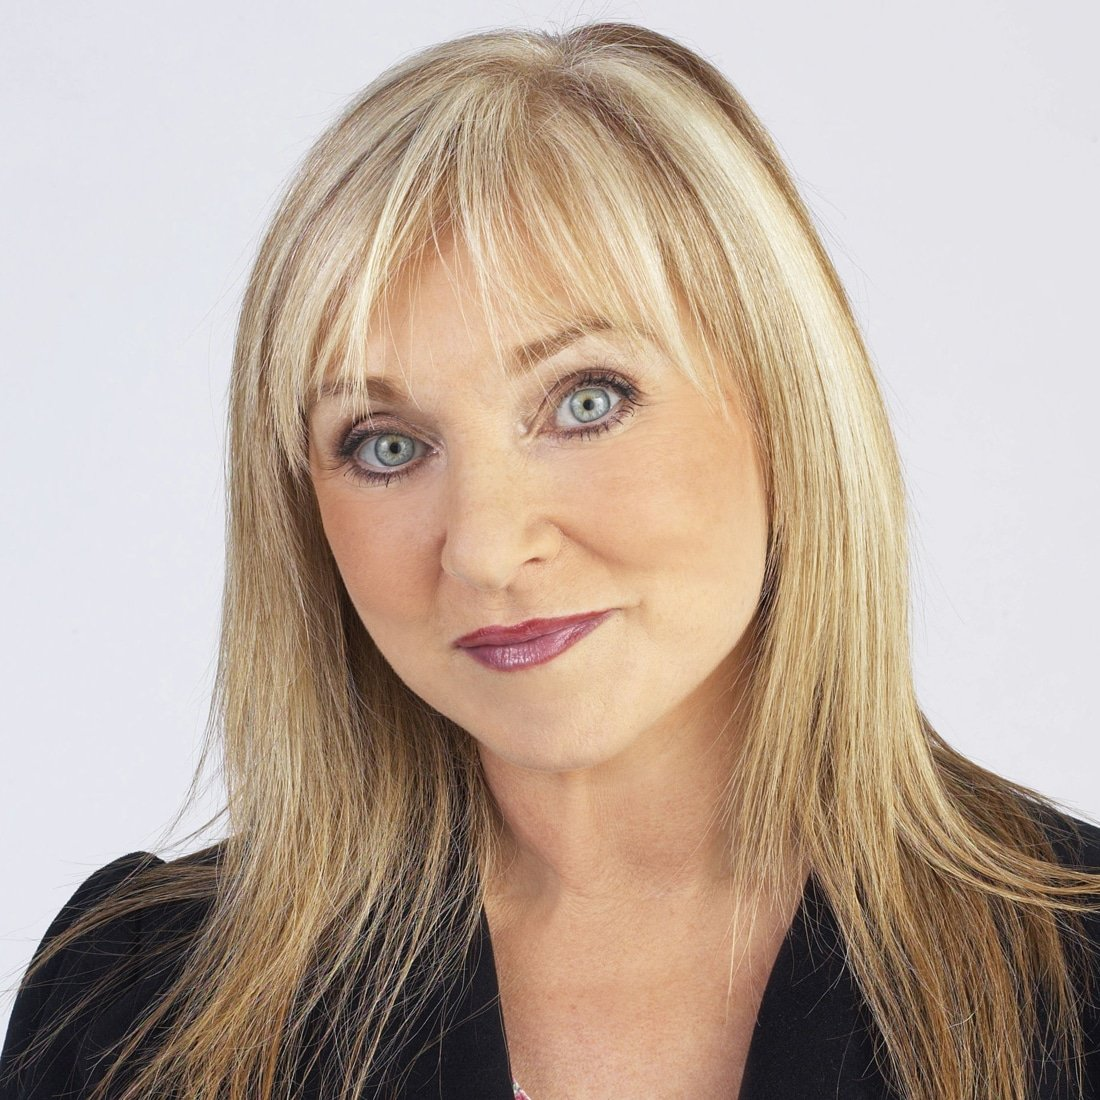 Helen-Lederer-Actress-Comedian-Writer-at-Great-British-Speakers